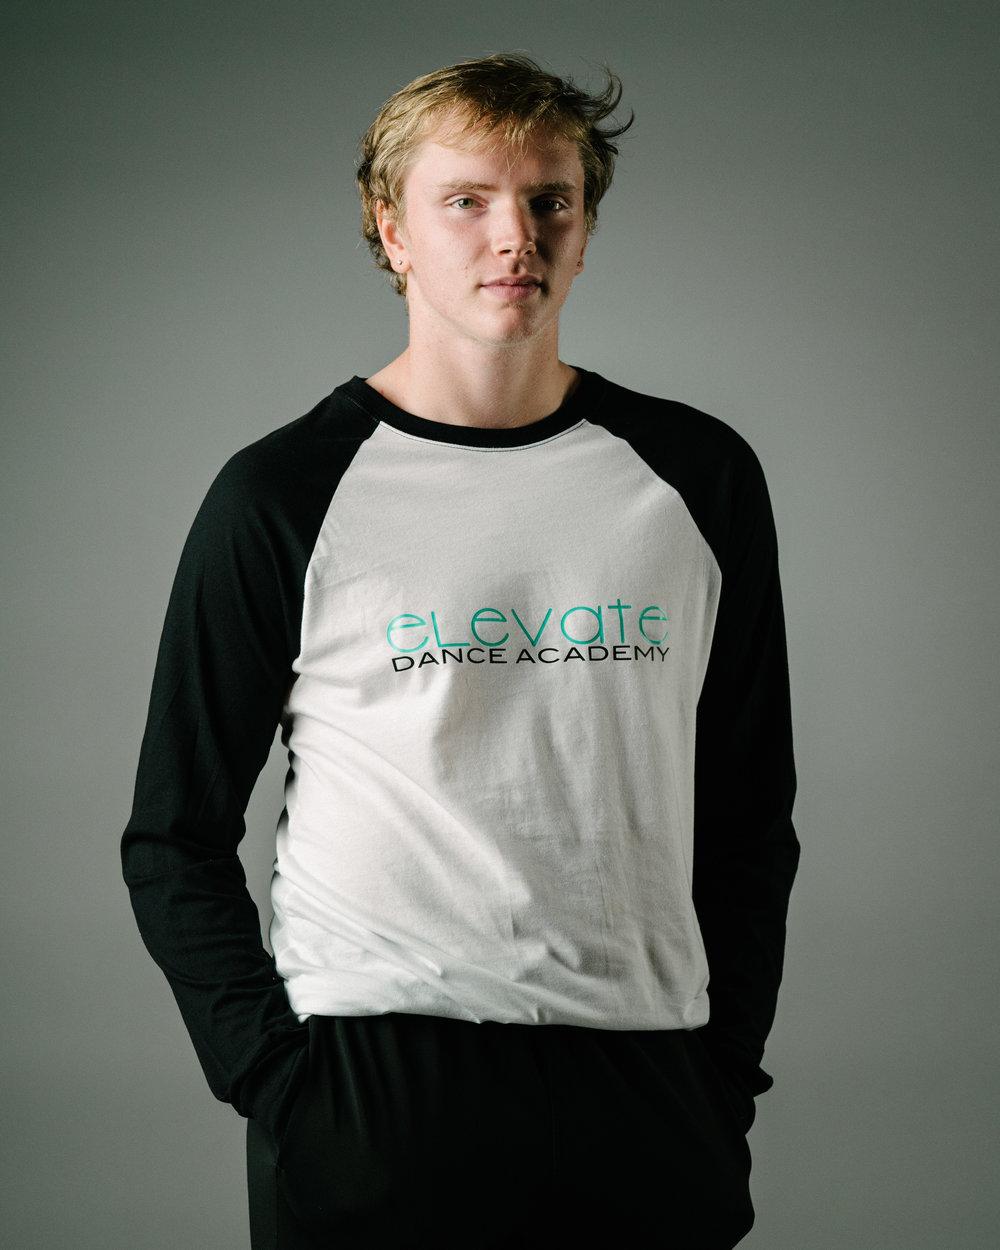 Black/White Baseball T-Shirt (Elevate logo)